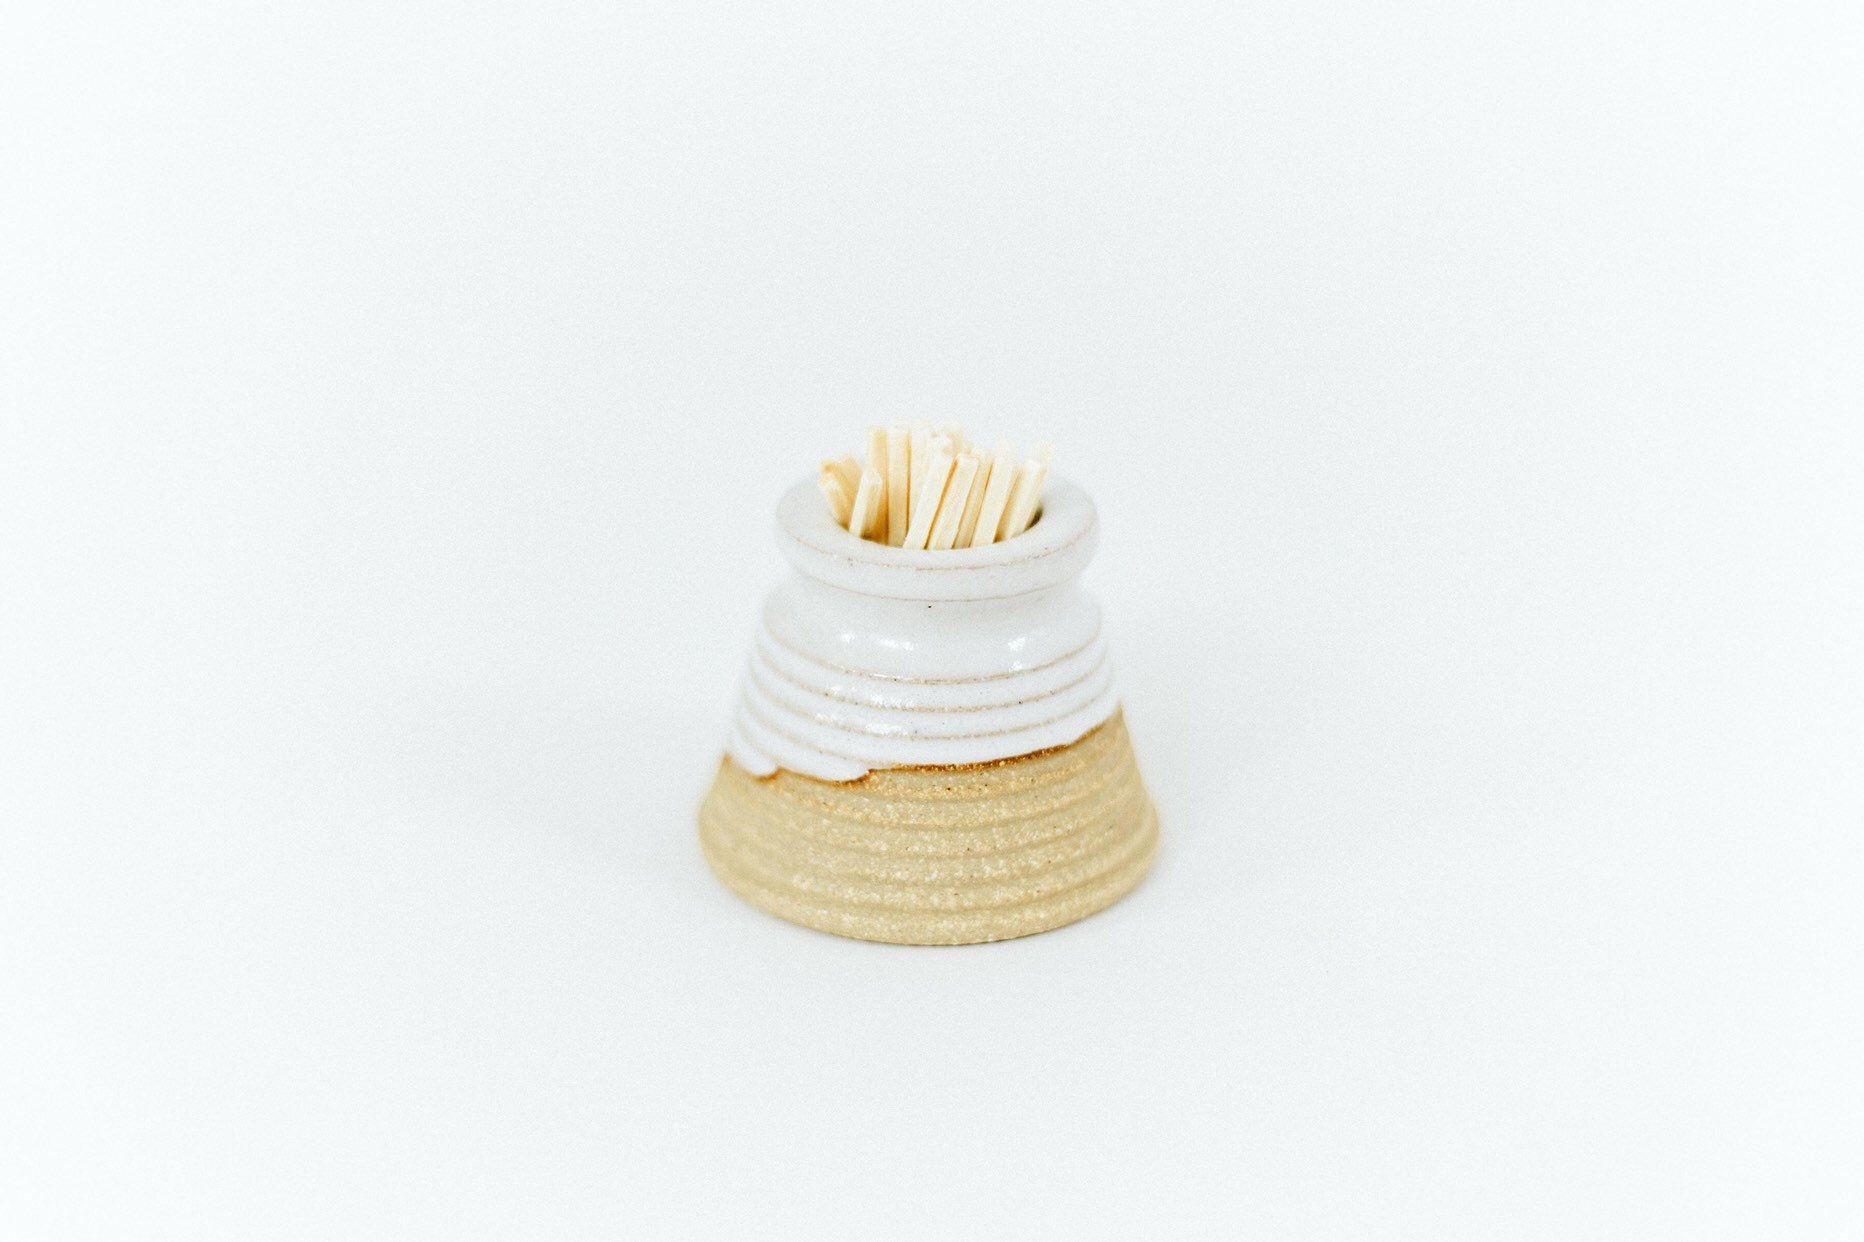 White Match Striker / Handmade Pottery / Match Holder